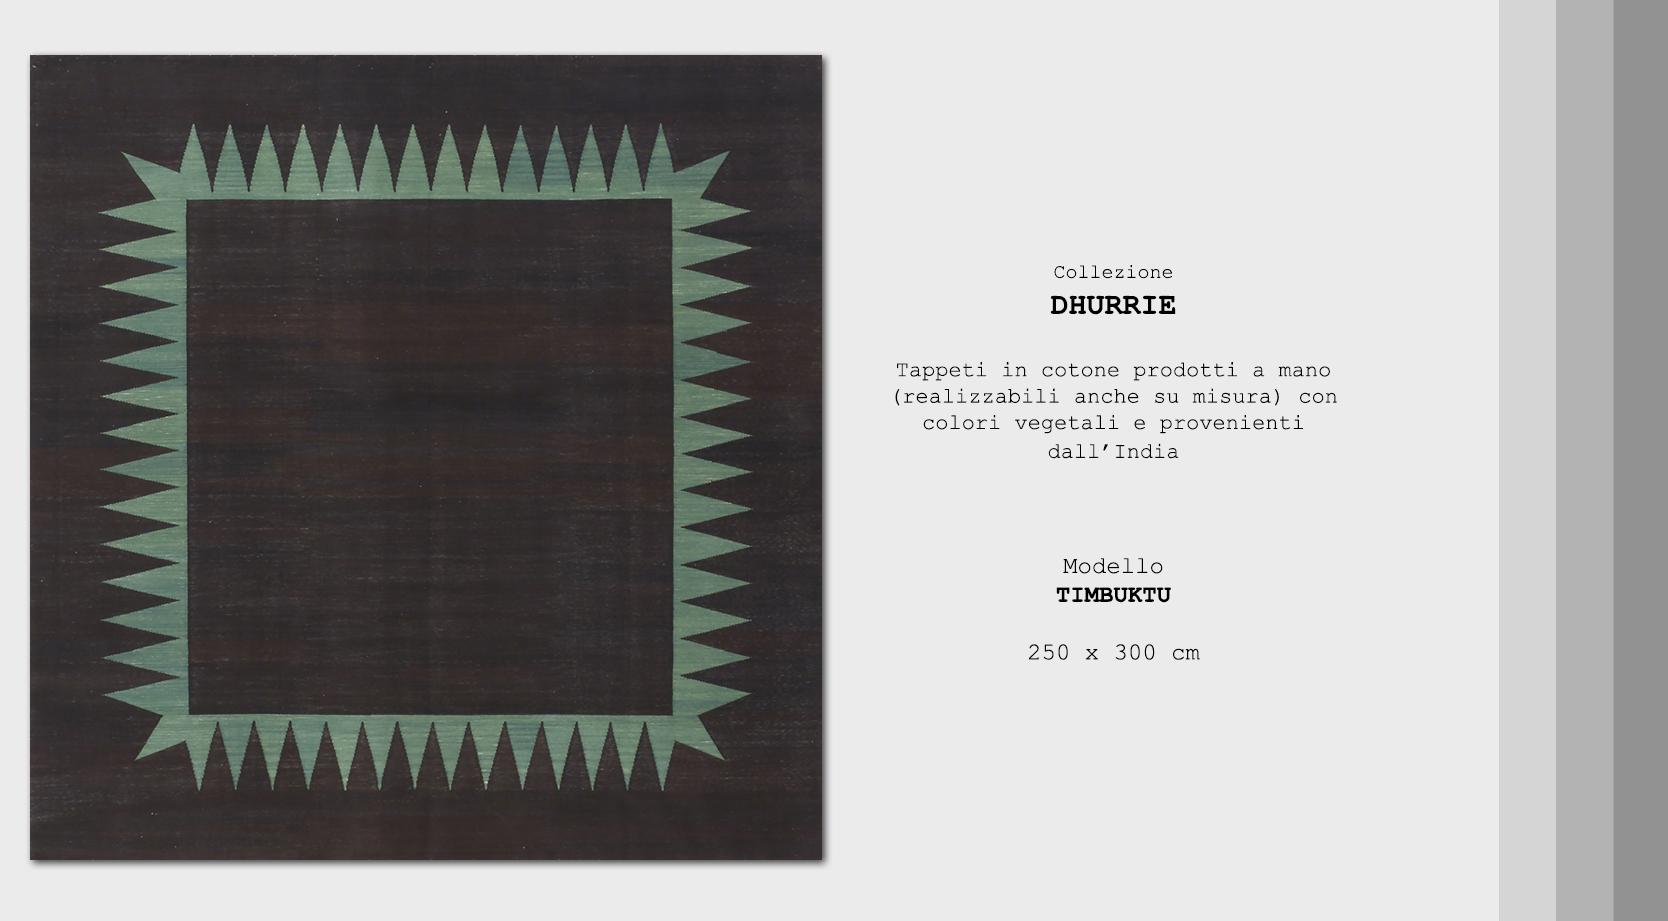 Timbuktu scuro.jpg